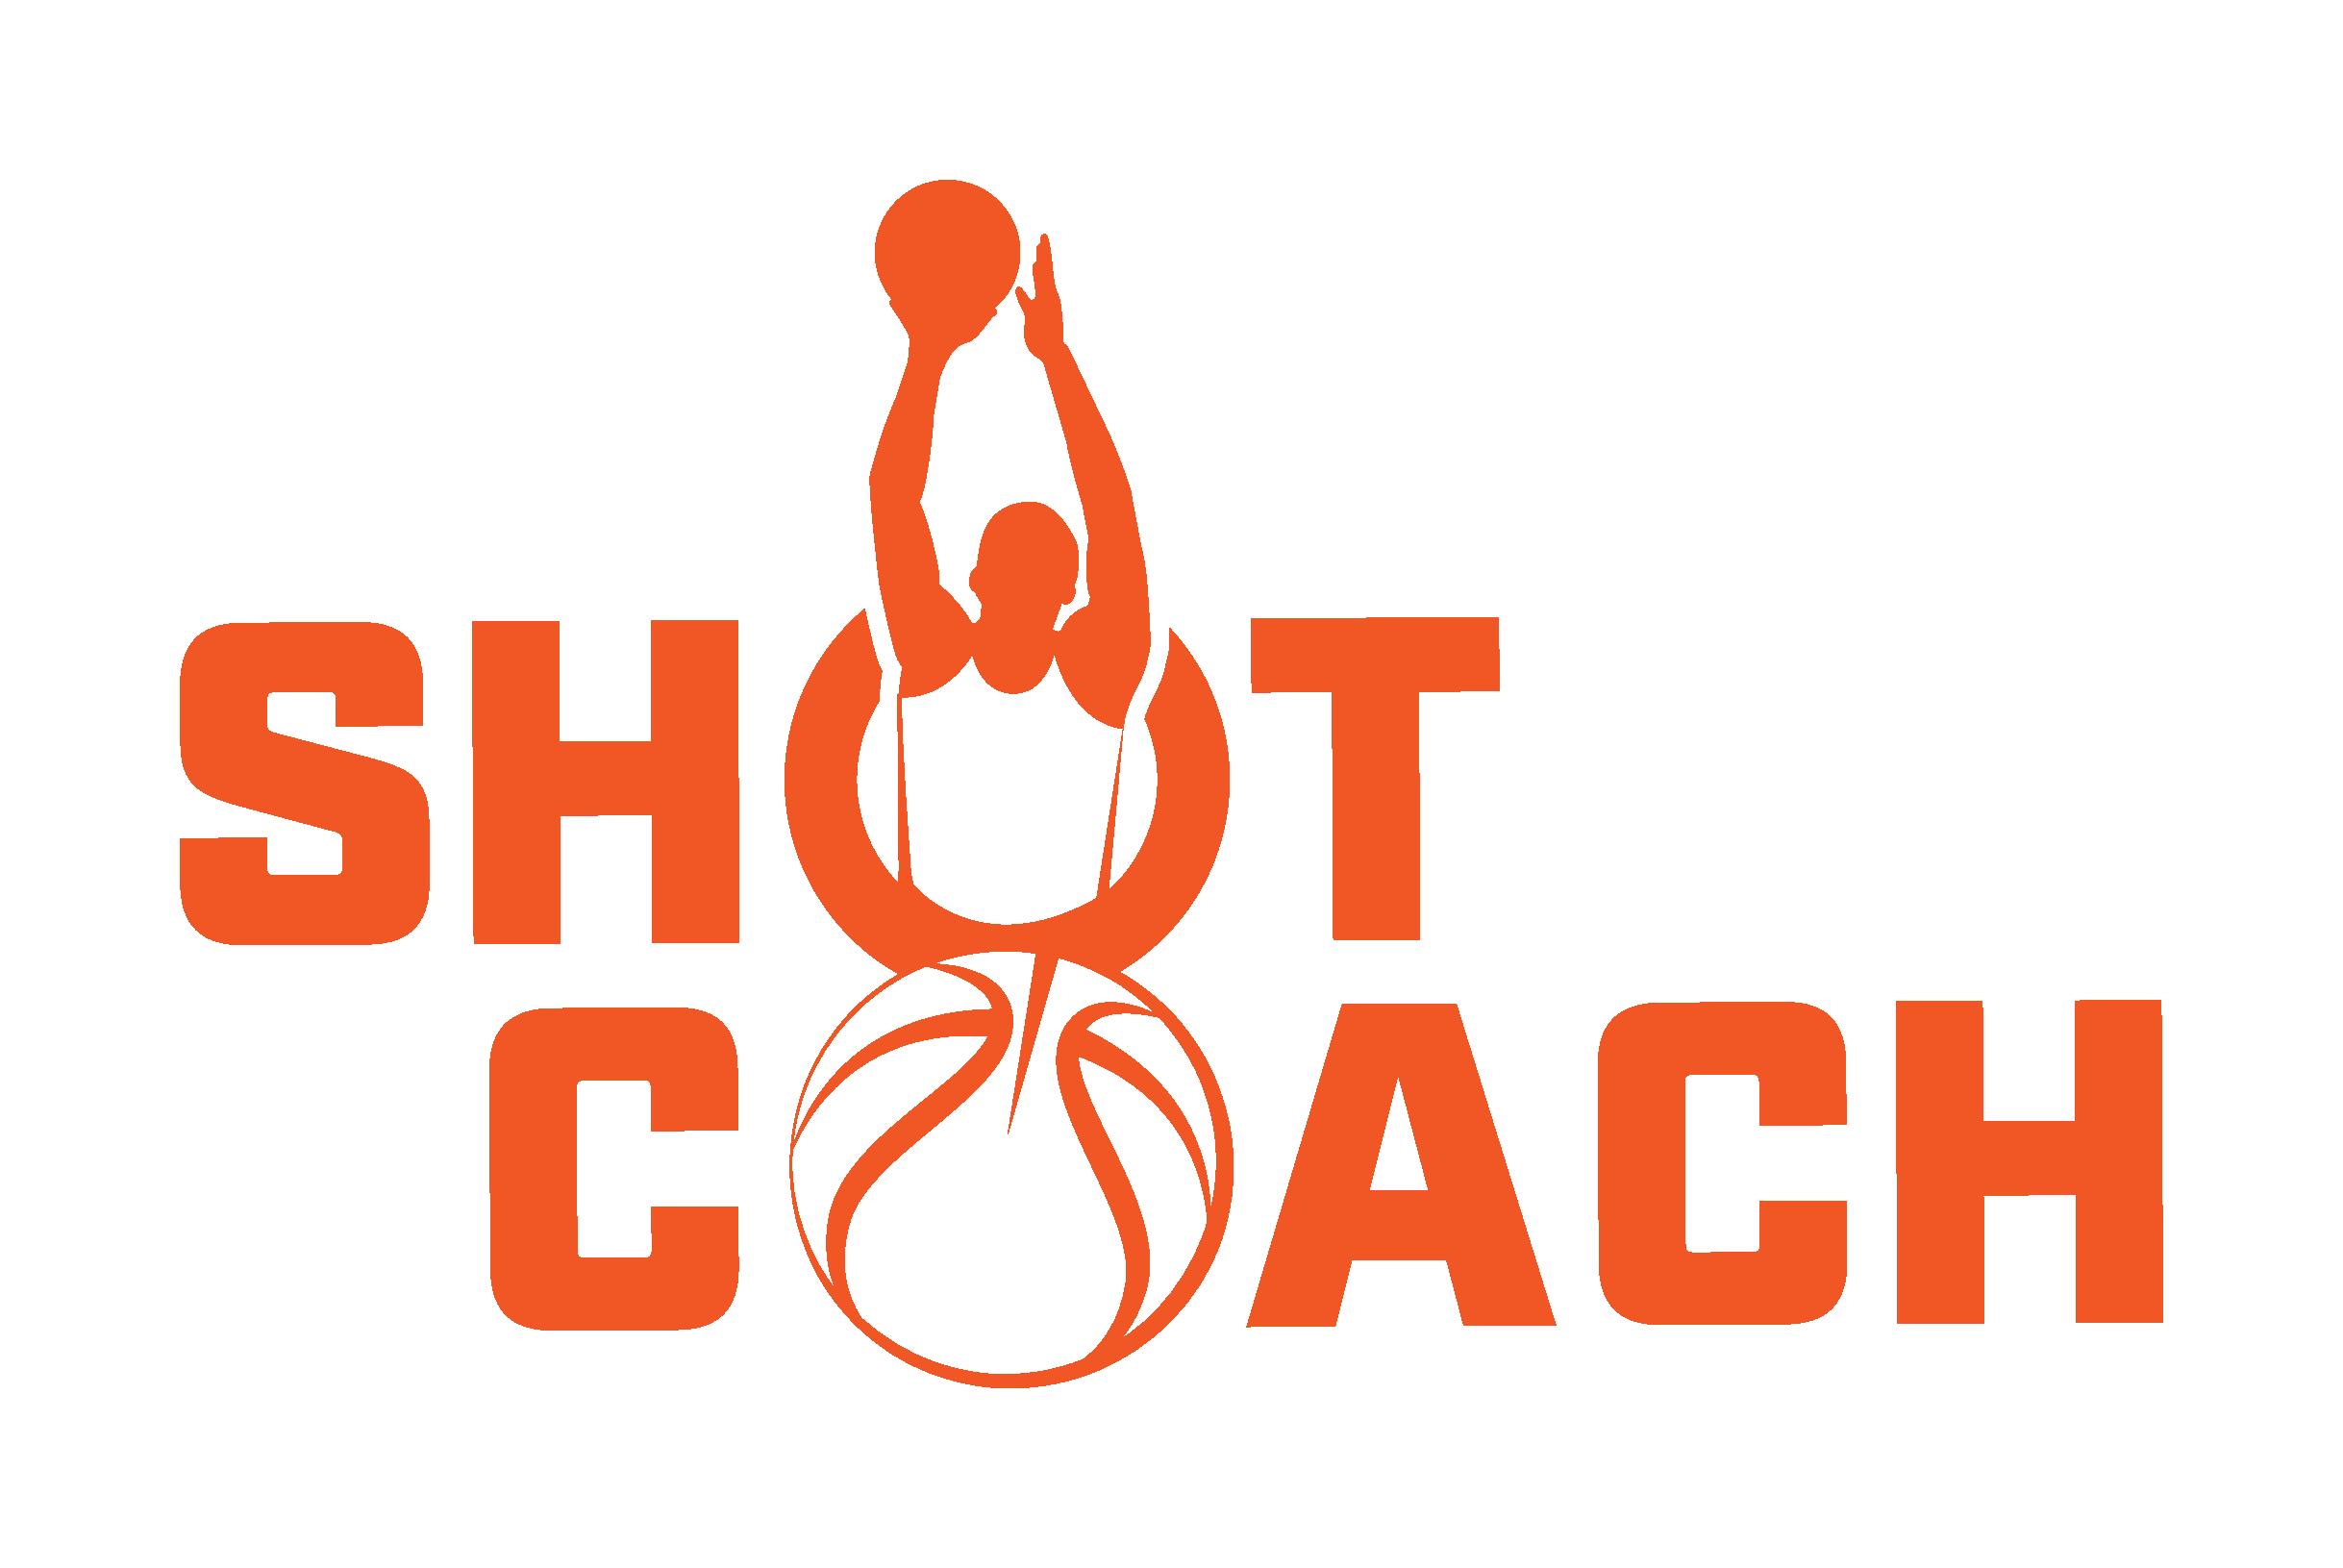 Shot Coach